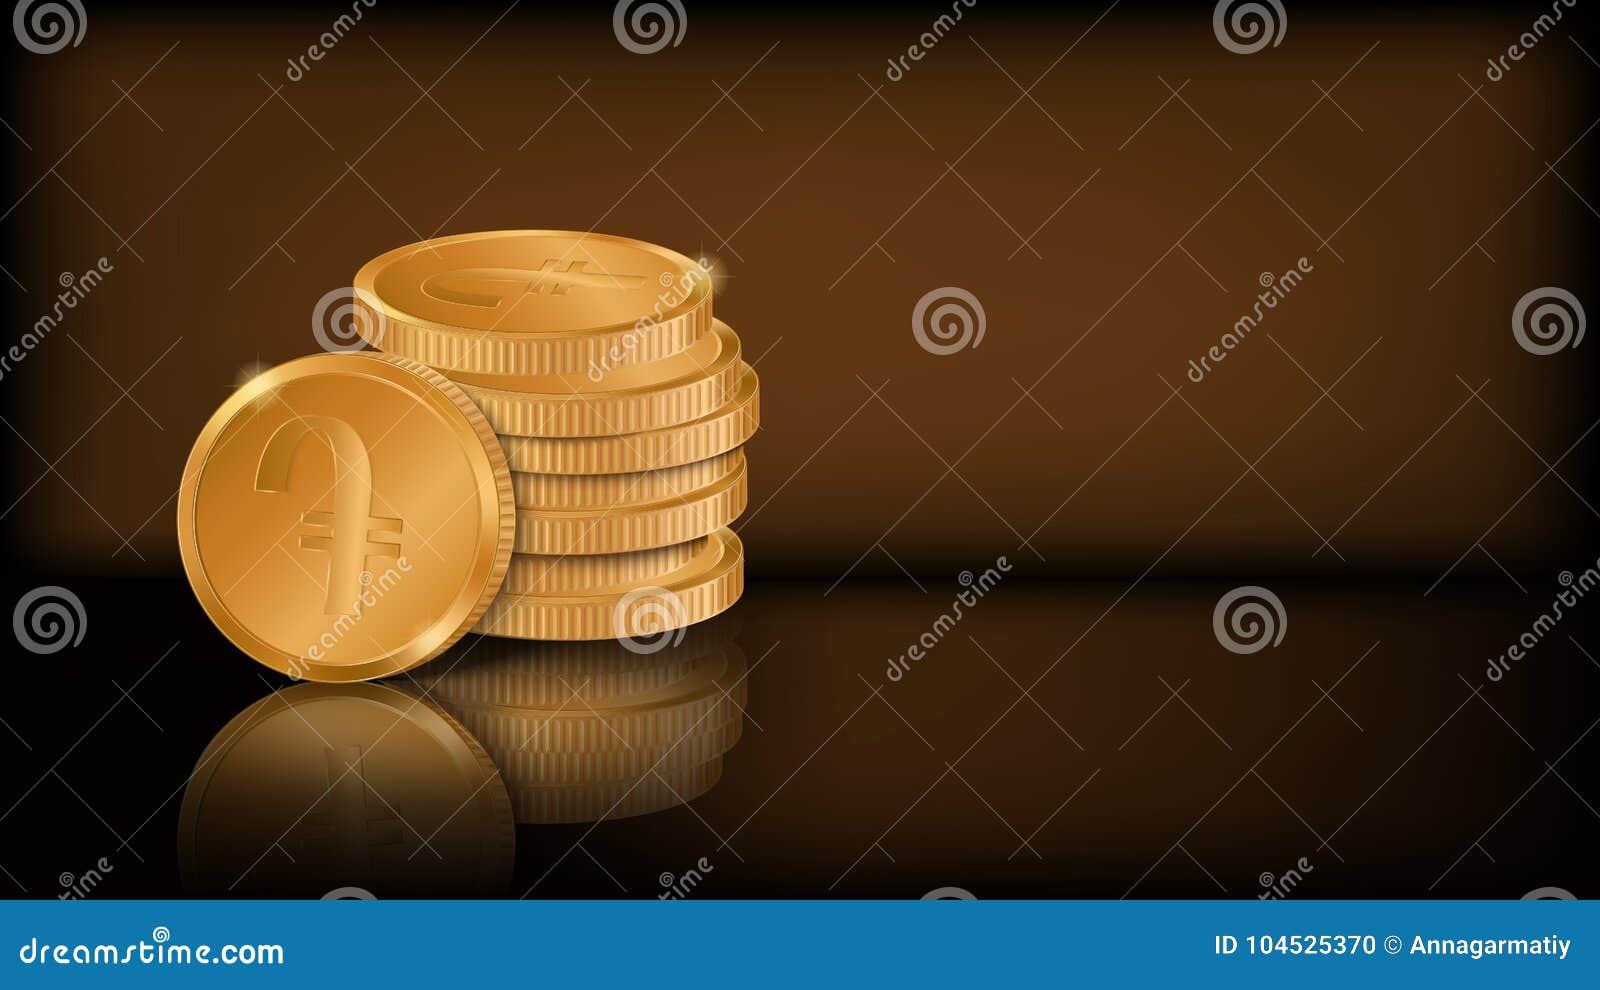 Pile Of Stylized Golden Coins Armenian Dram Symbol Stock Vector